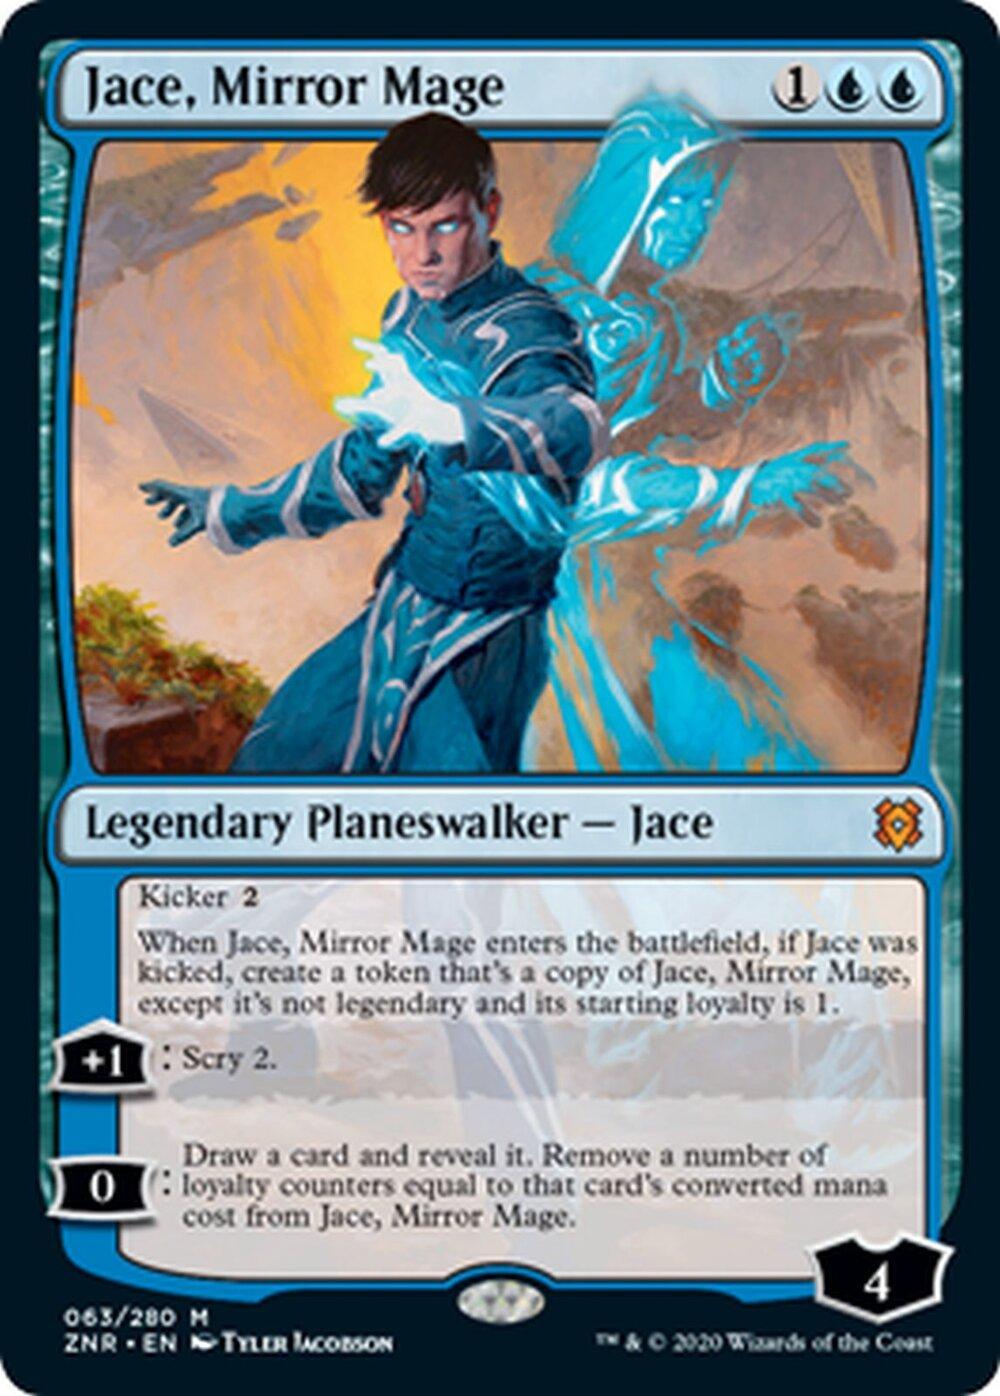 Jace, Mirror Mage.jpg